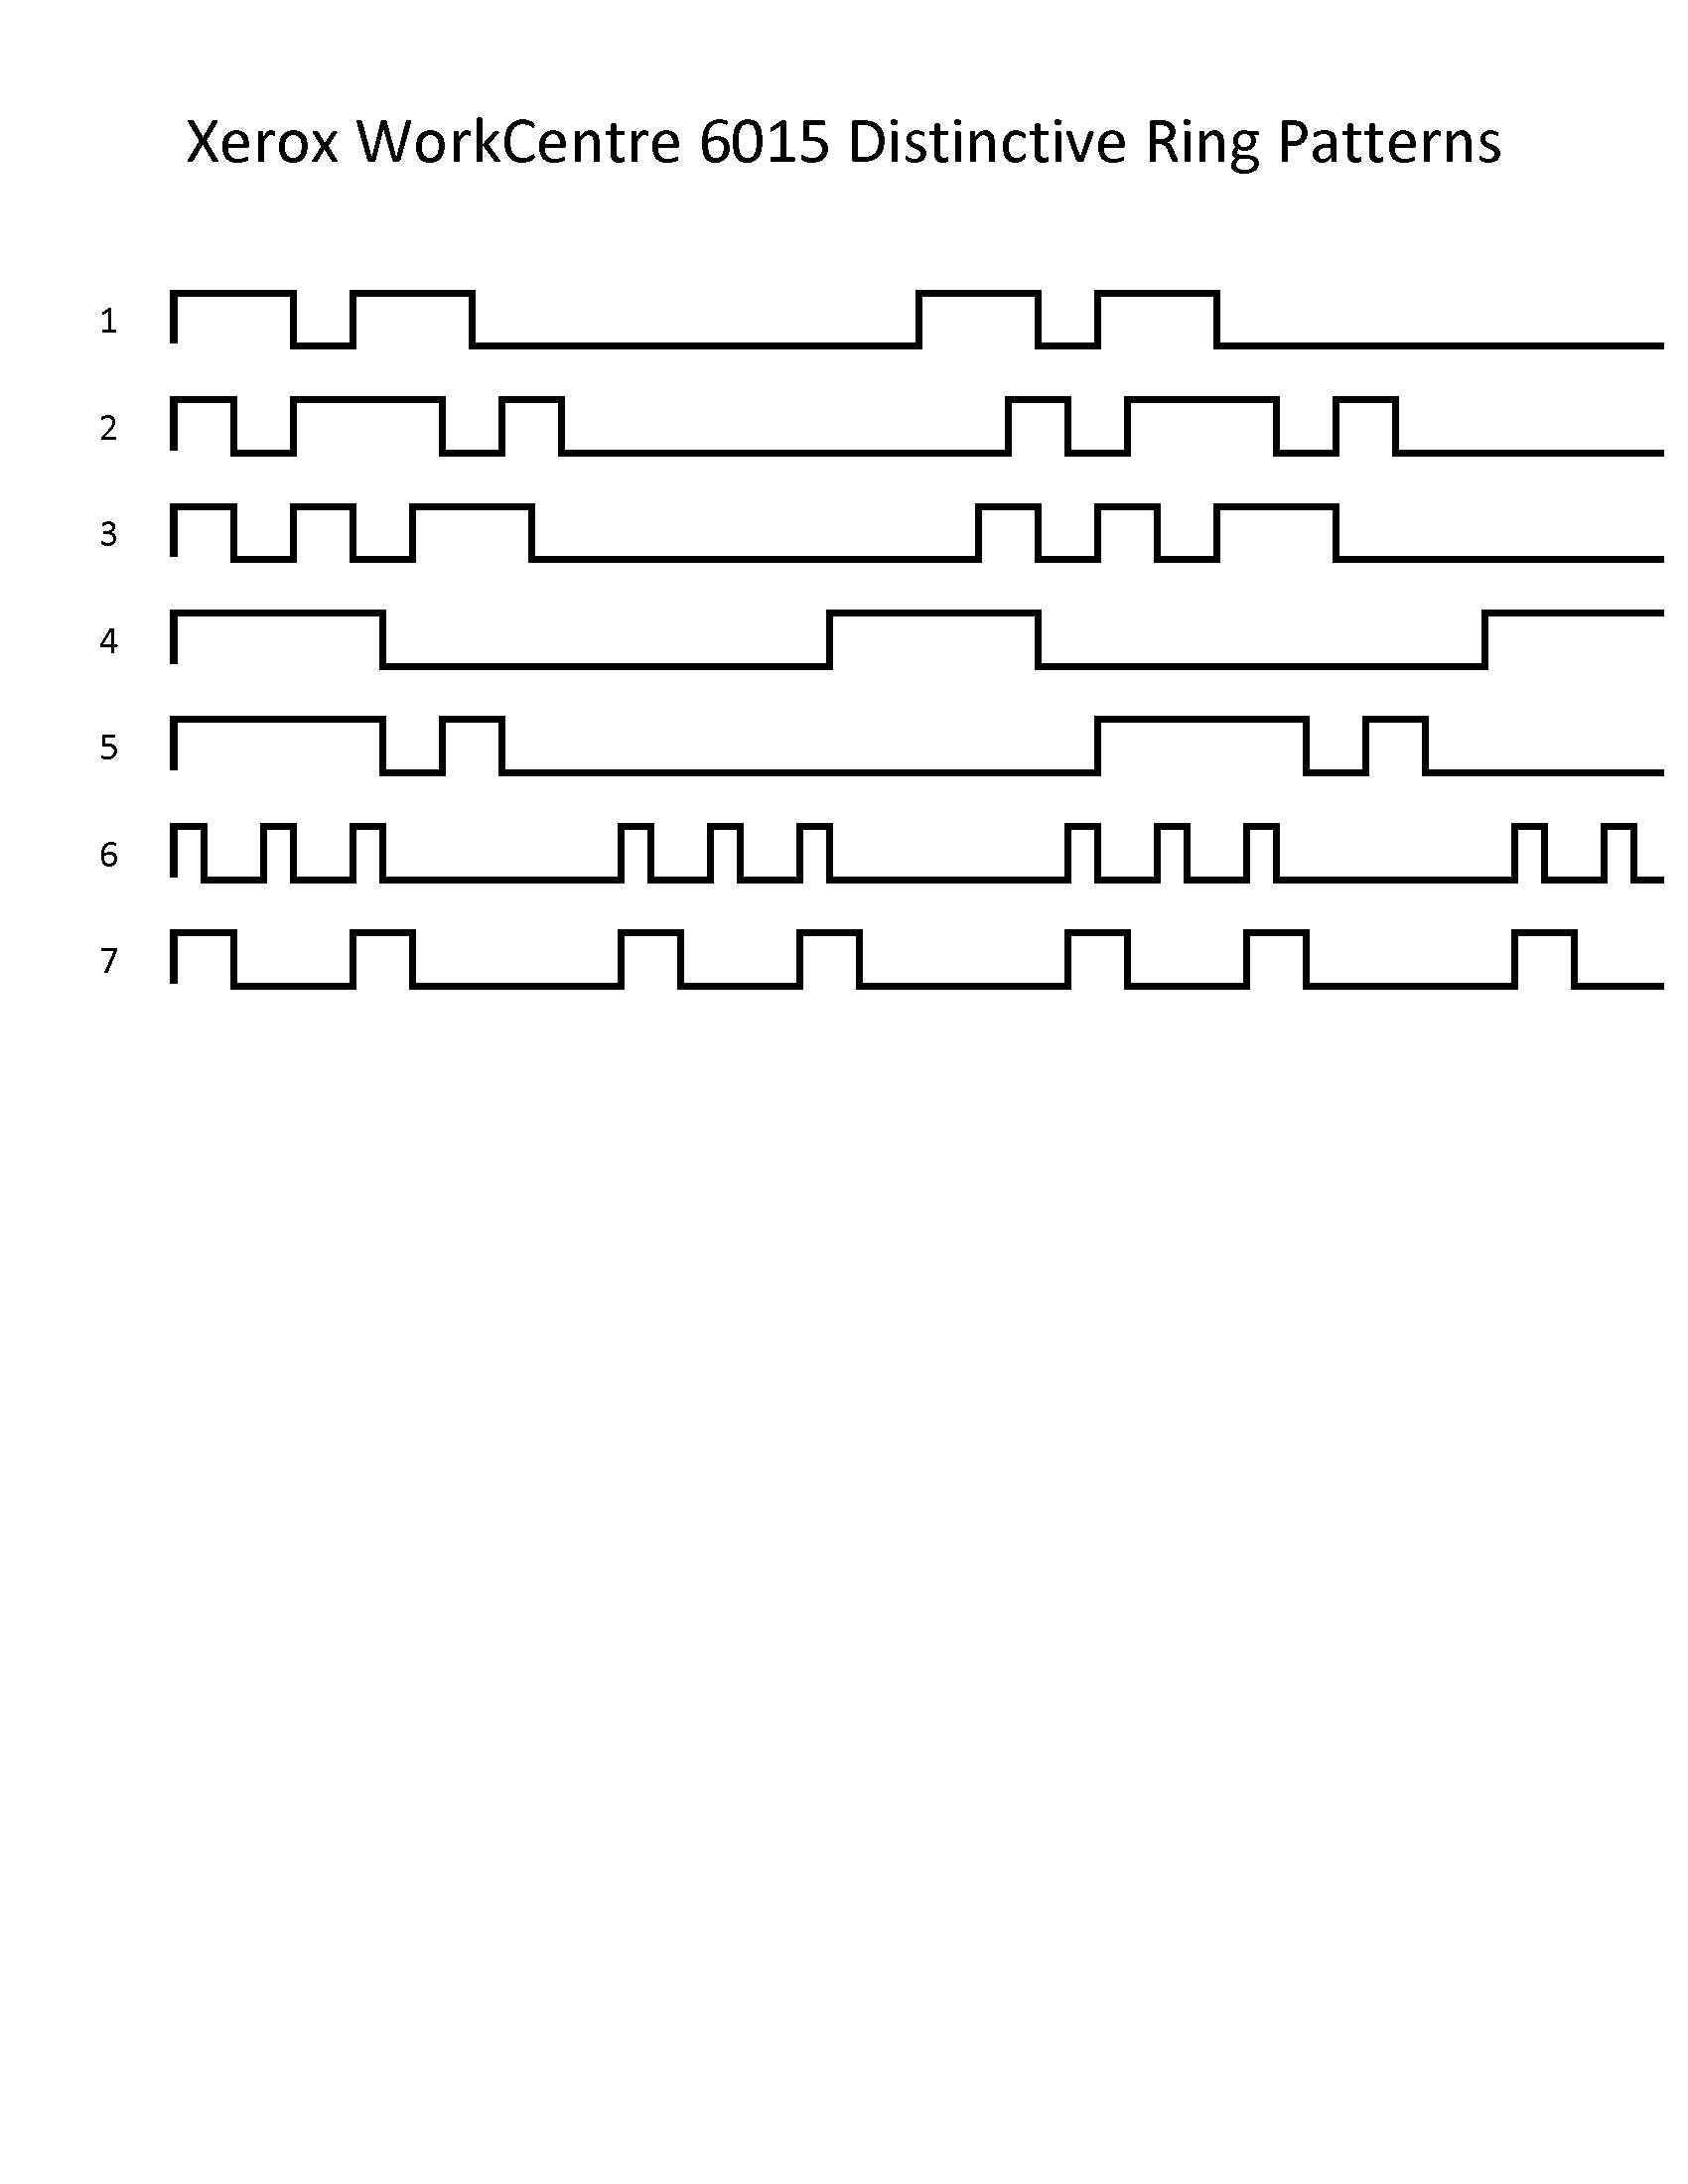 Xerox WorkCentre 6015 Distinctive Ring Patterns.jpg